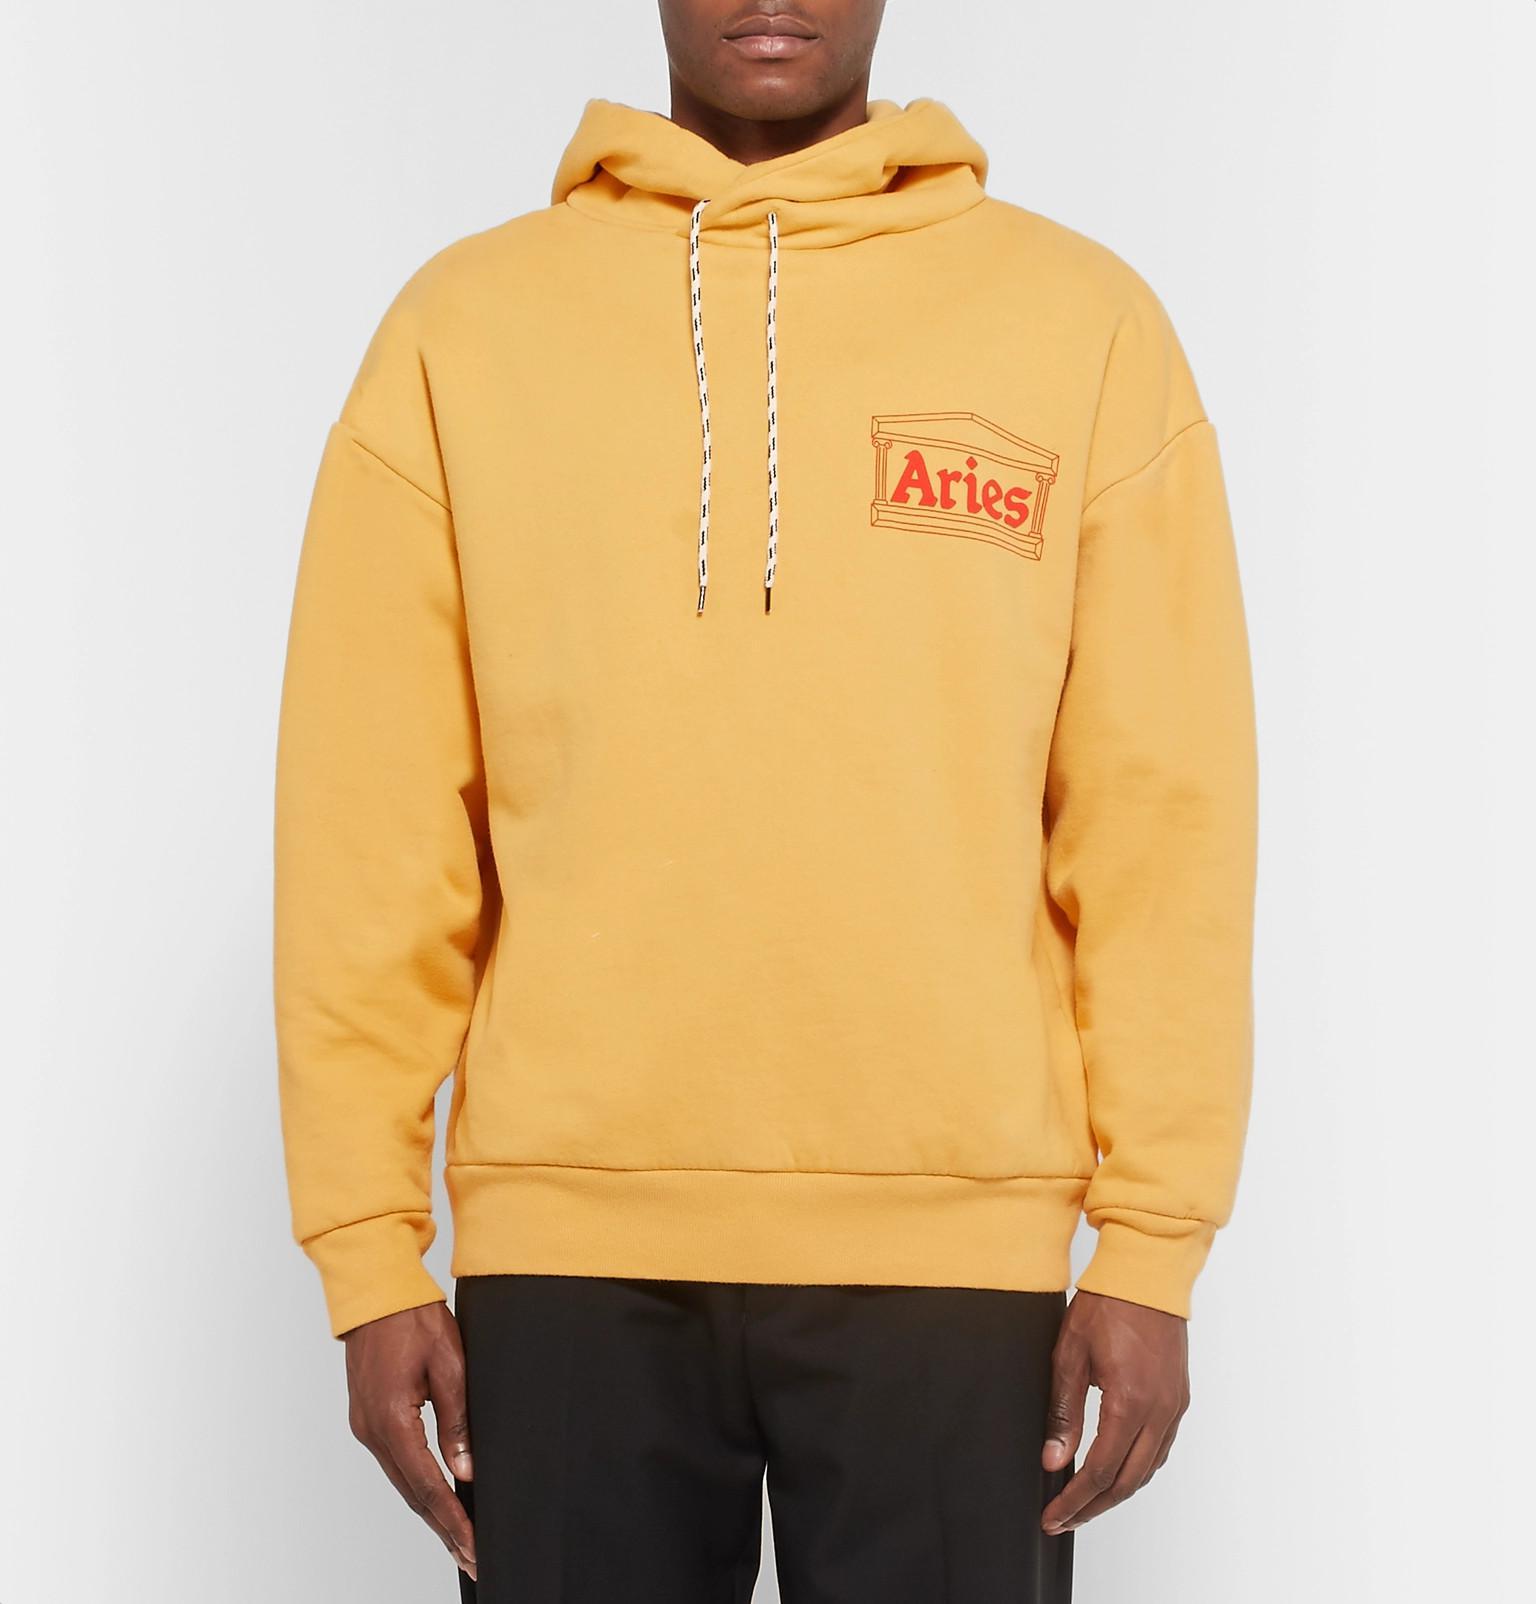 Fullscreen Cotton Logo Lyst Men Print Jersey For Hoodie View Aries Yellow A76wBB